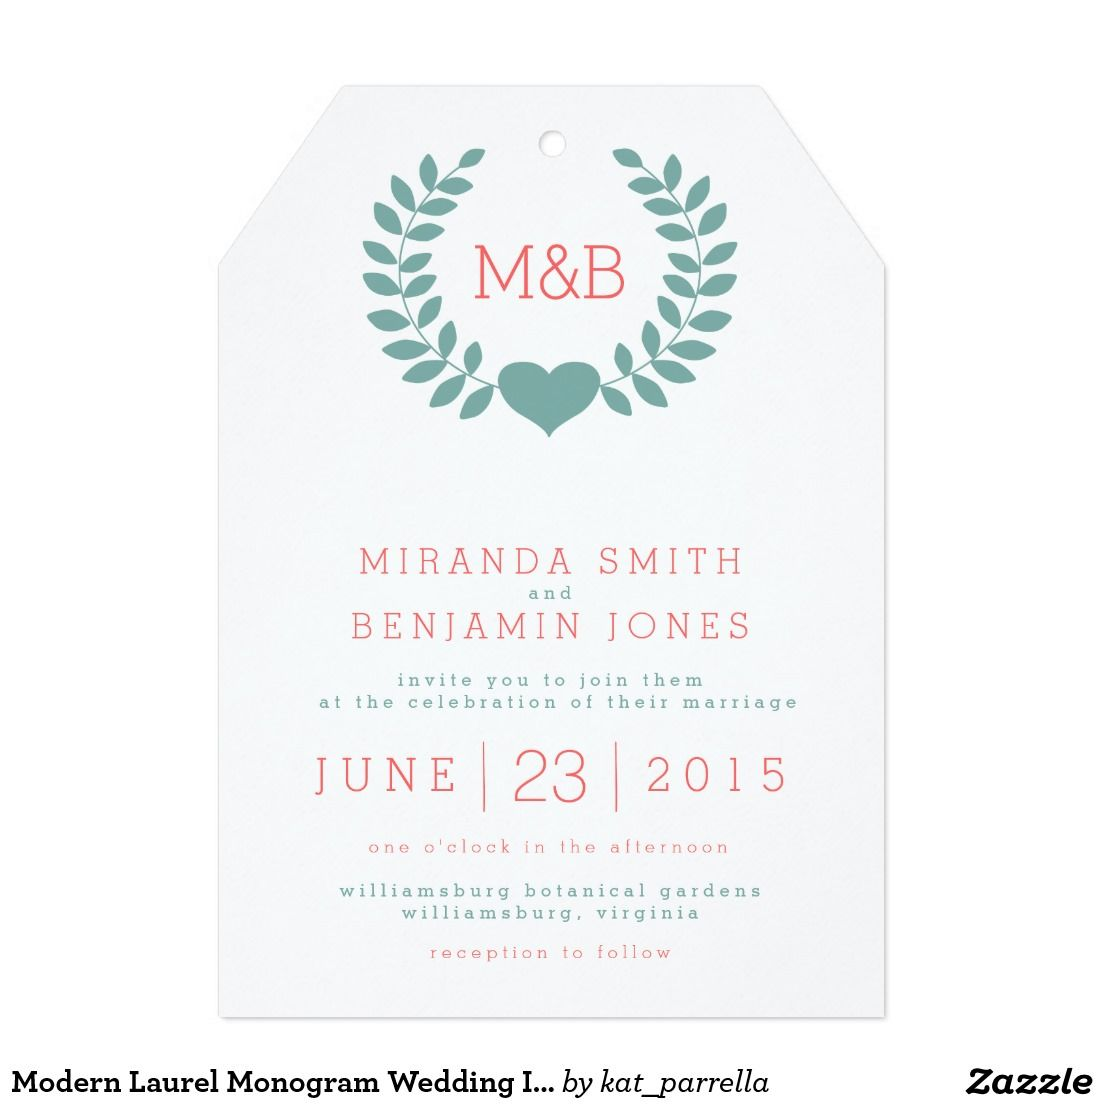 Modern Laurel Monogram Wedding Invitation | Pinterest | Wedding ...